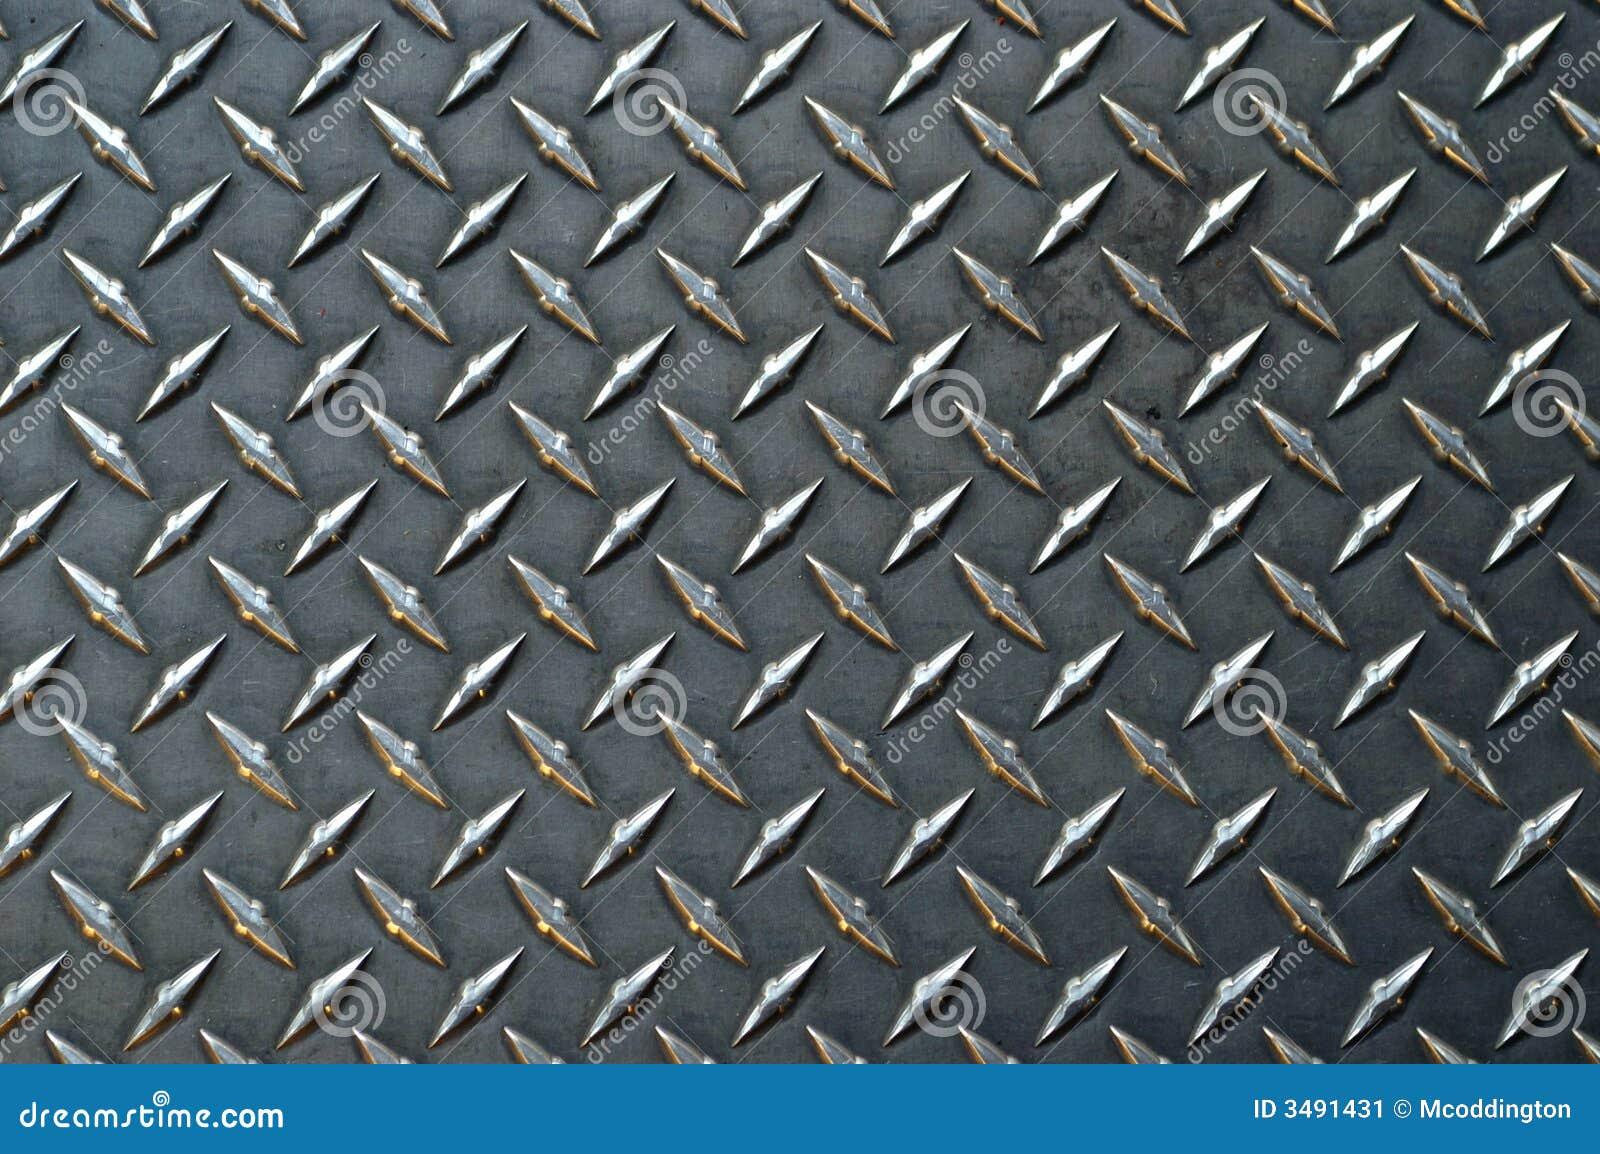 Graues Farbiges Diamantplatten-BAC Stockbild - Bild von kreuz, criss ...